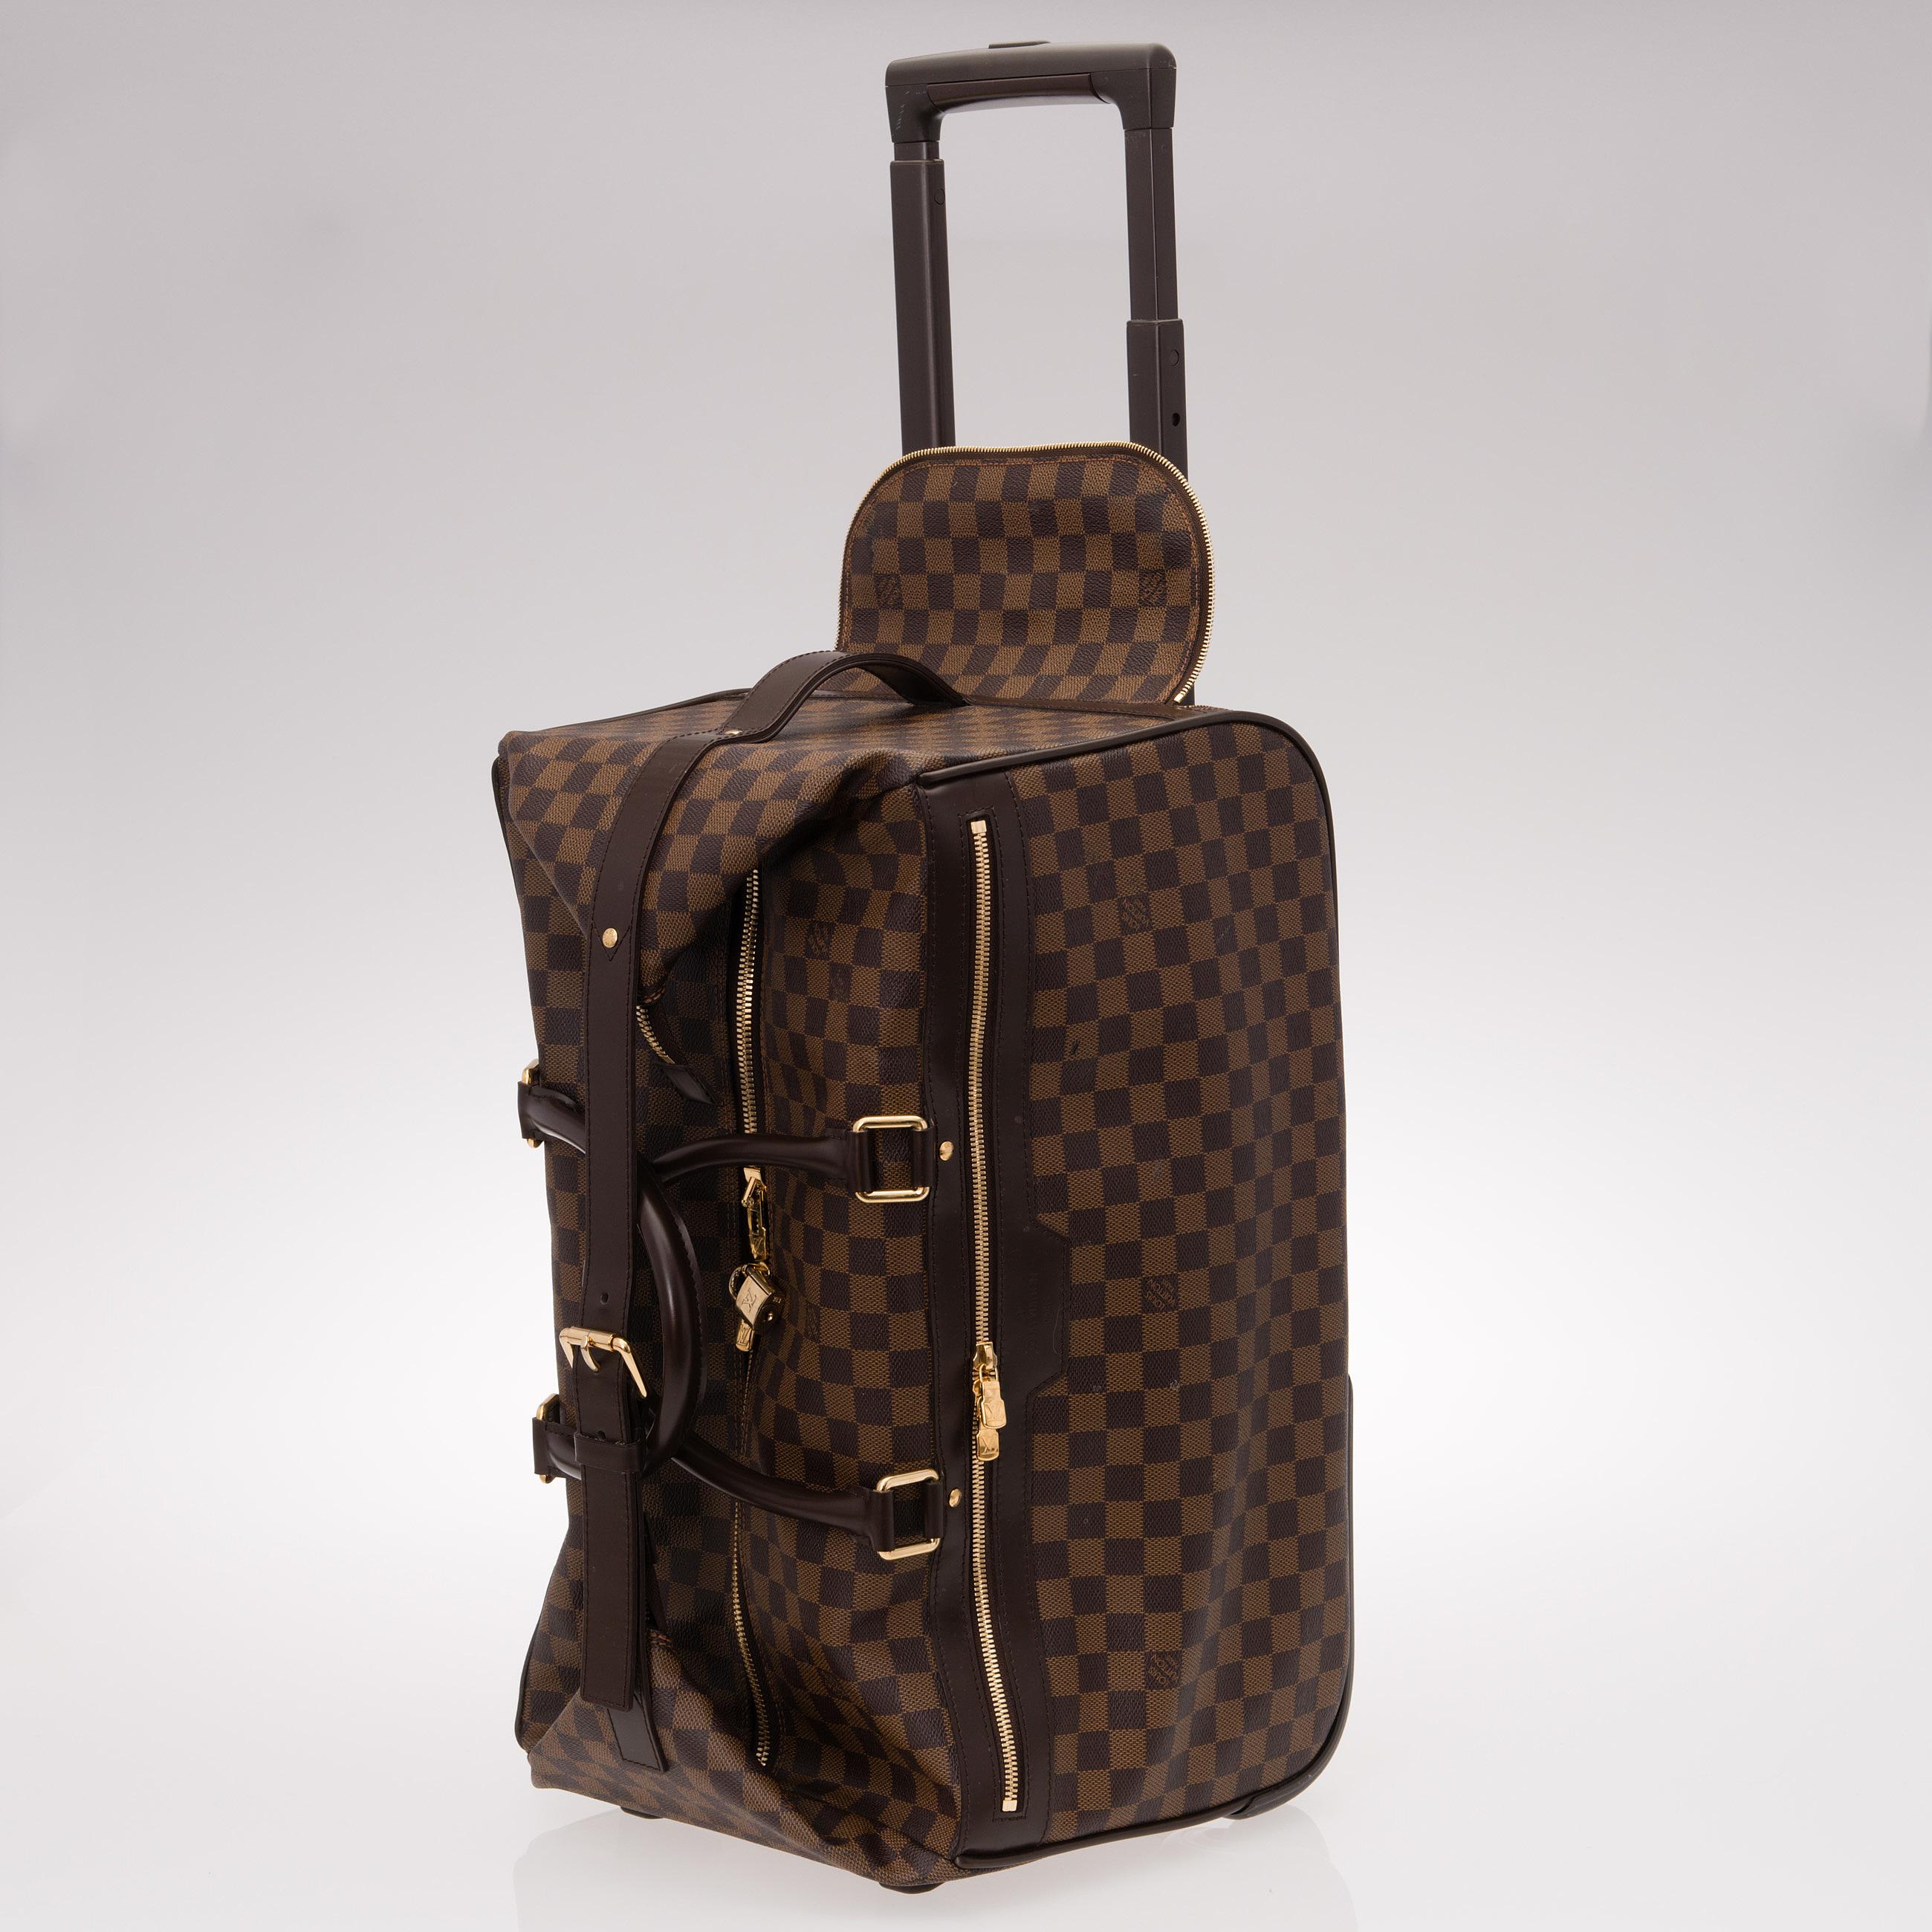 b106199afa4e DAMIER EBENE EOLE 50 TRAVEL BAG. A rolling luggage ...